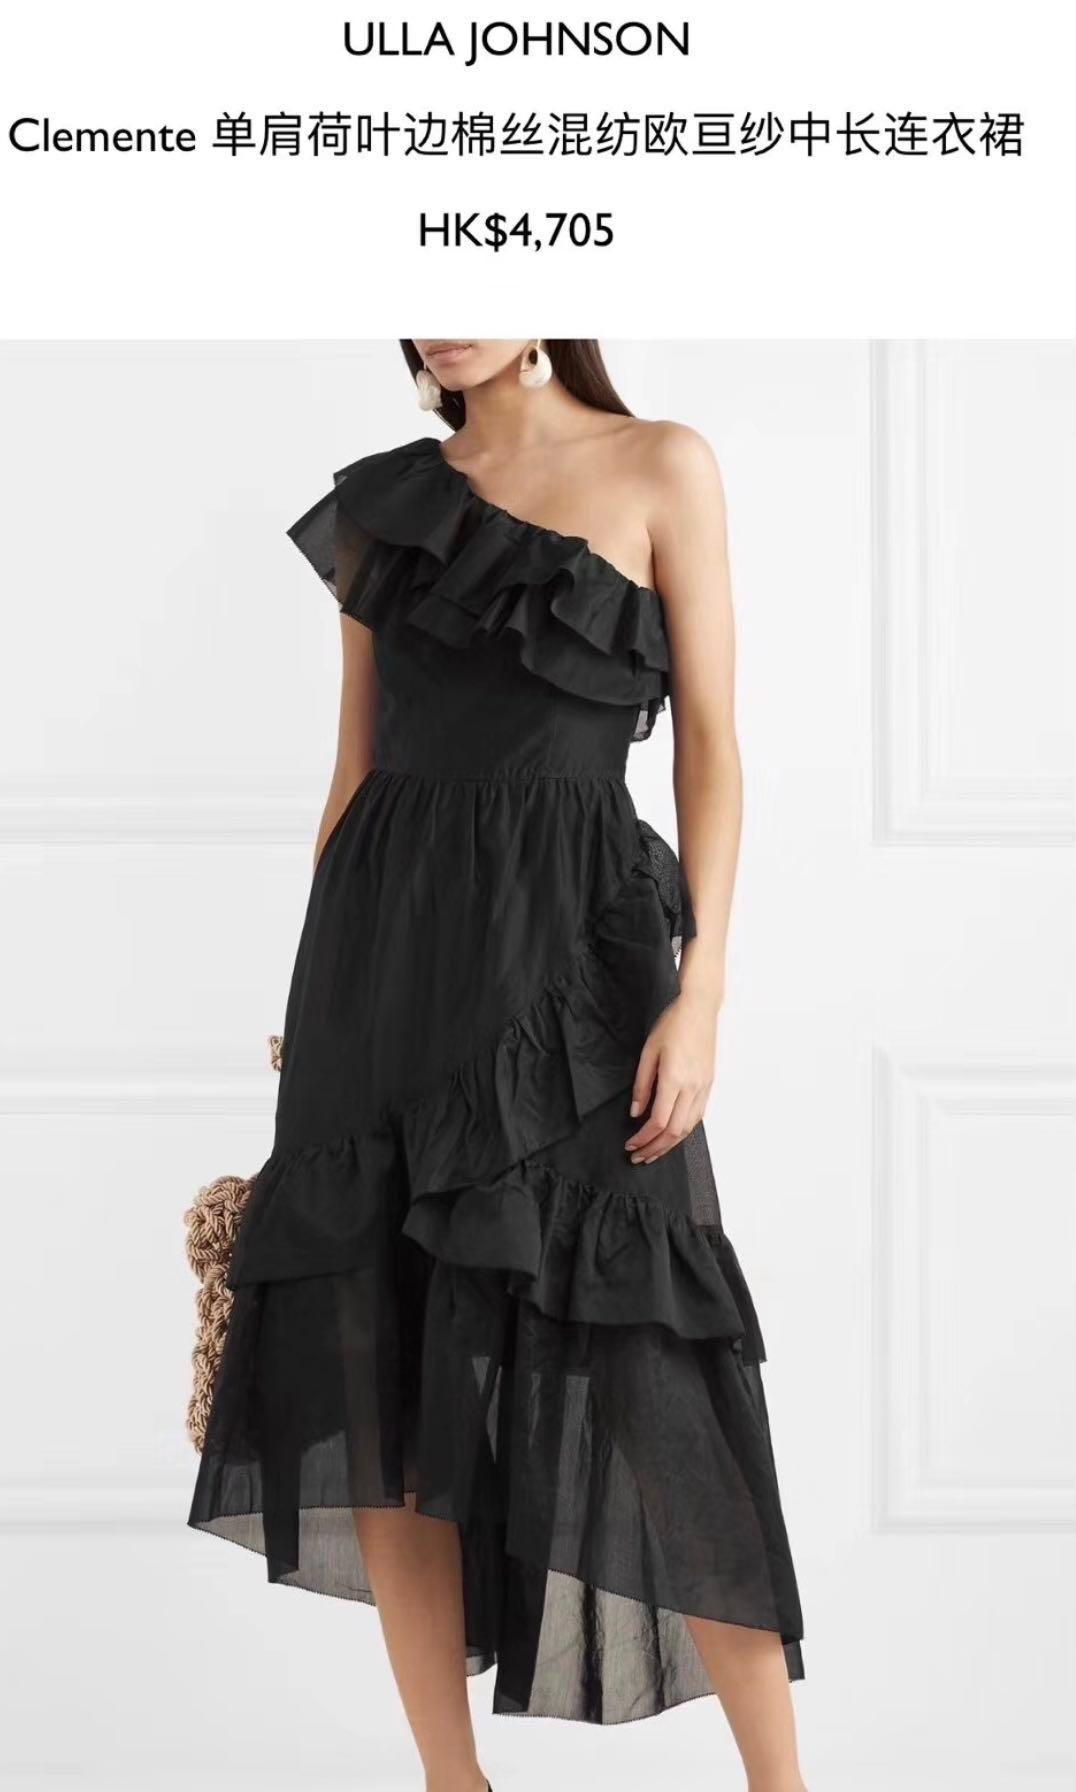 a230f1bd75deb SALE) BN Ulla Johnson One Shoulder Dress